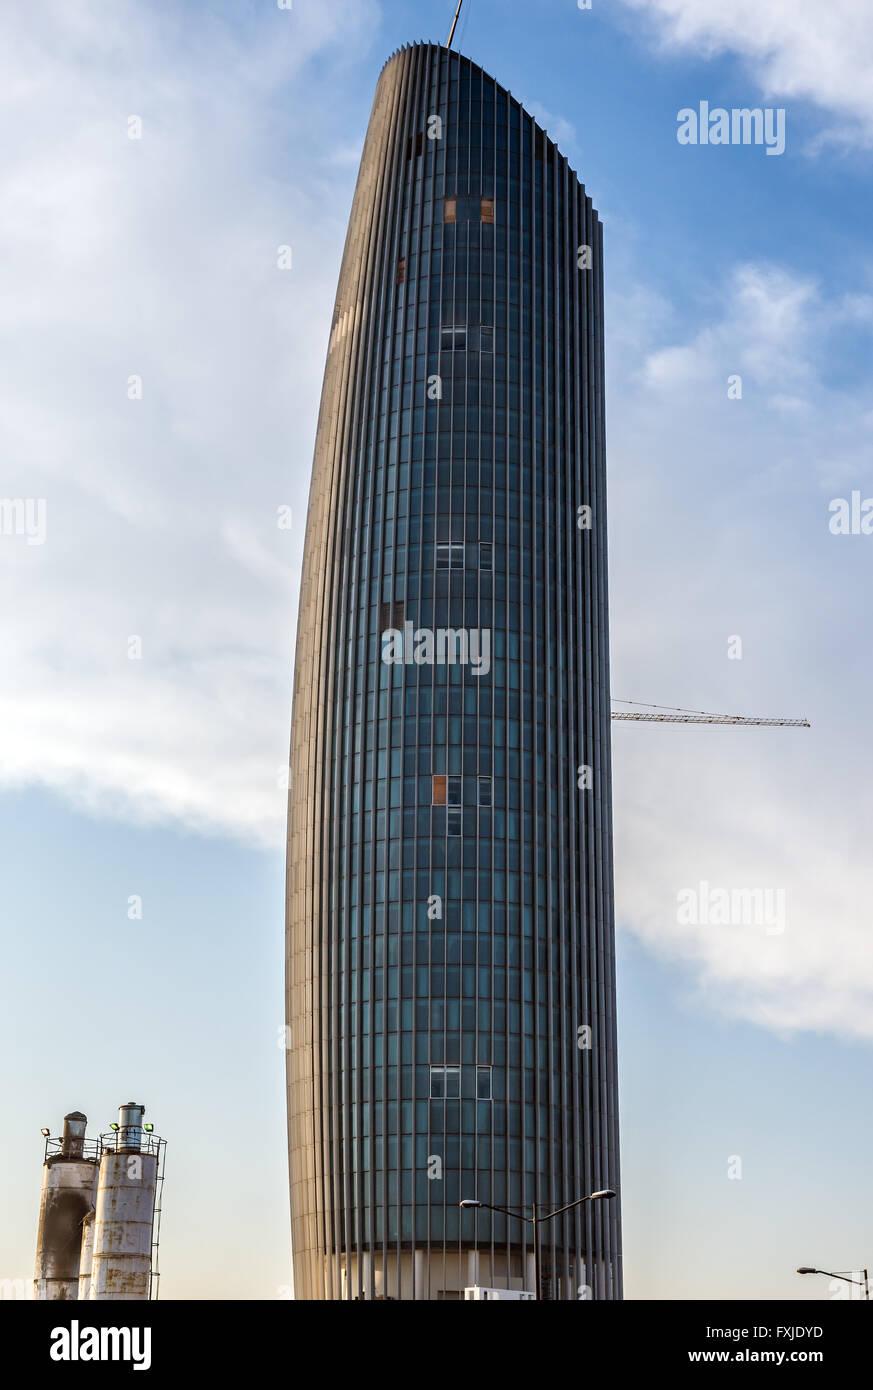 Amman Rotana Hotel Tower Part Of Abdali Project In City Capital Jordan